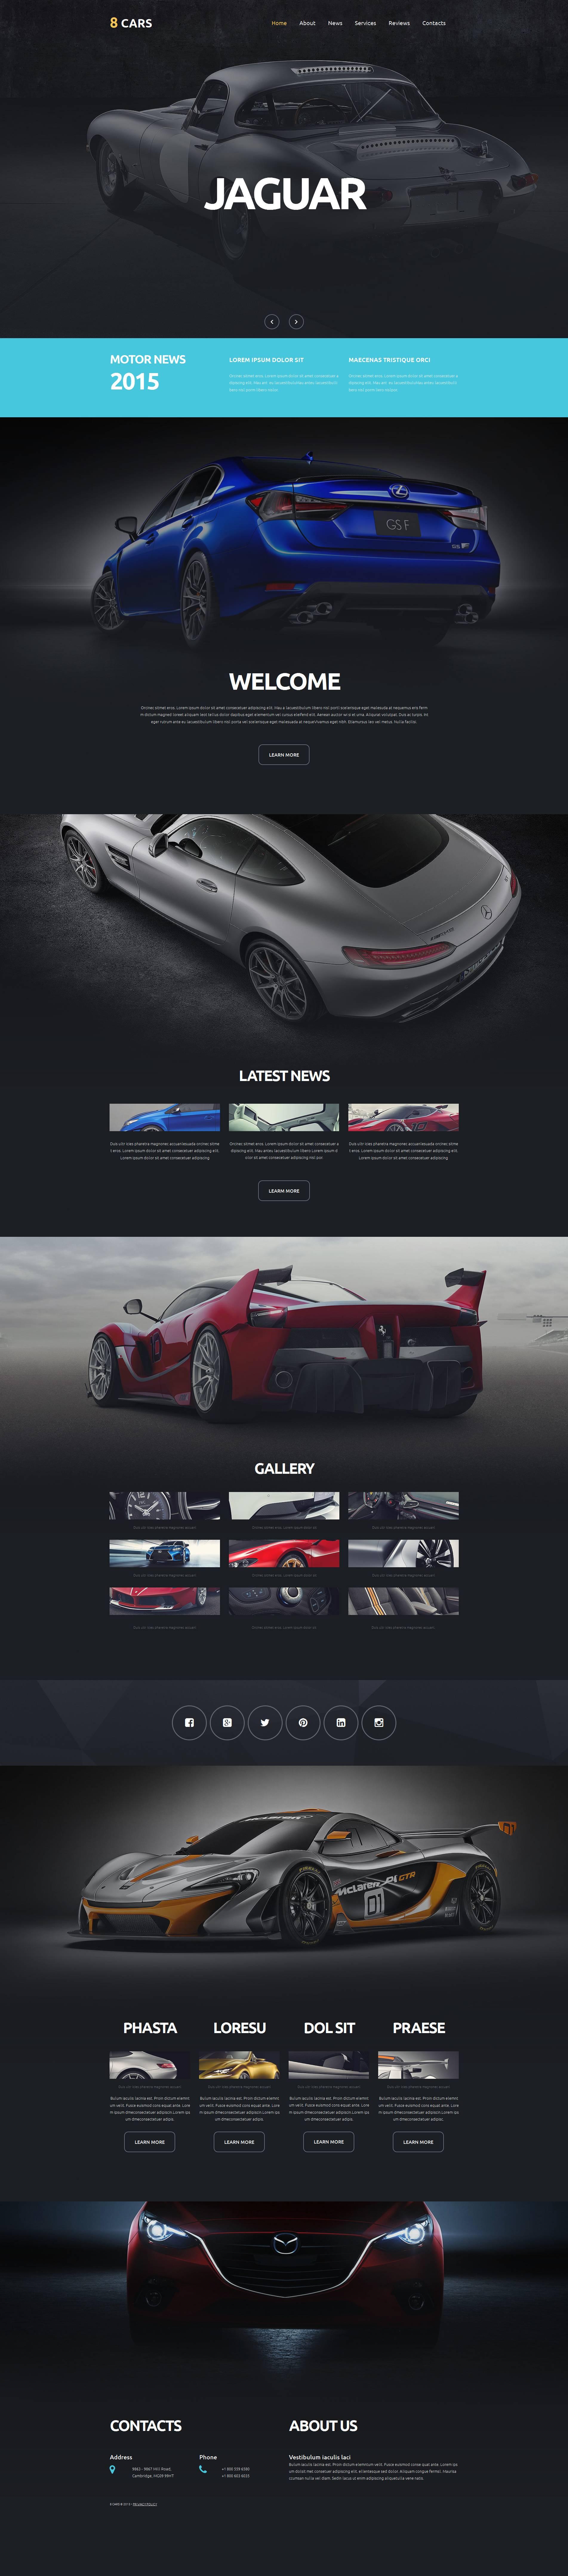 Car Club Responsive Moto CMS 3 Template - screenshot